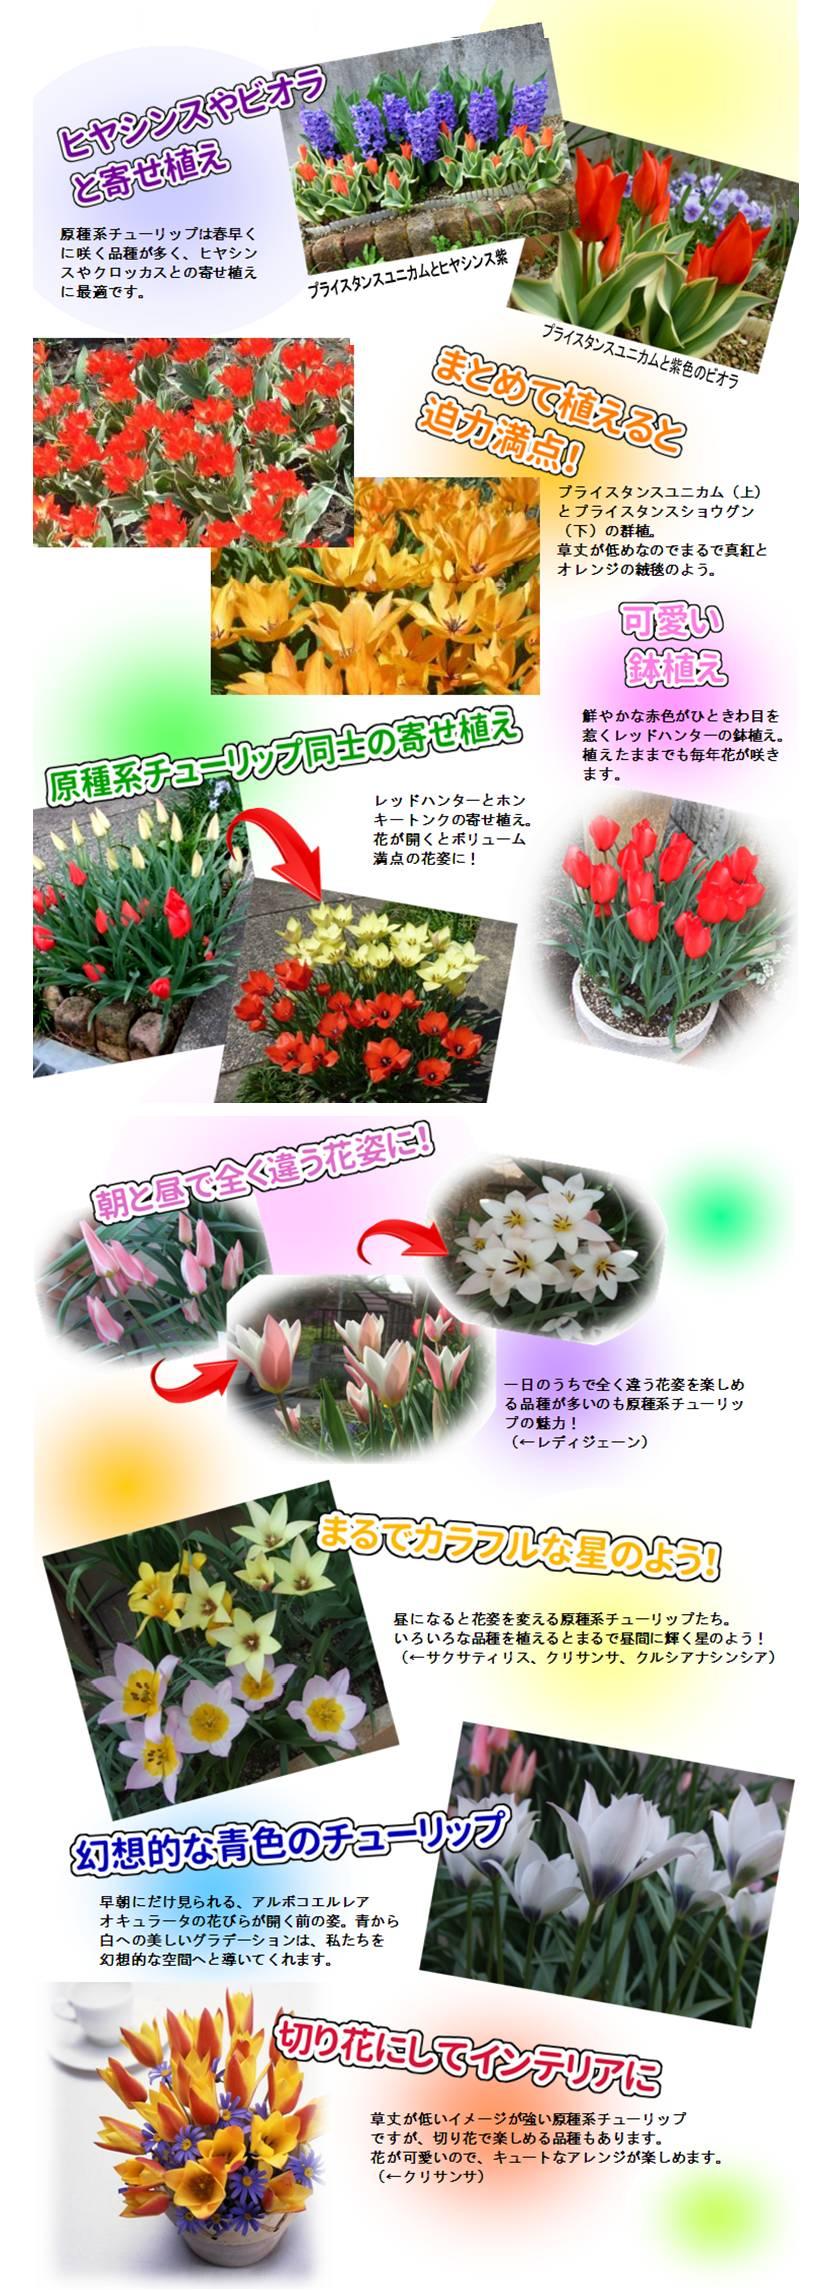 hajimete_tulip_tanoshimikata